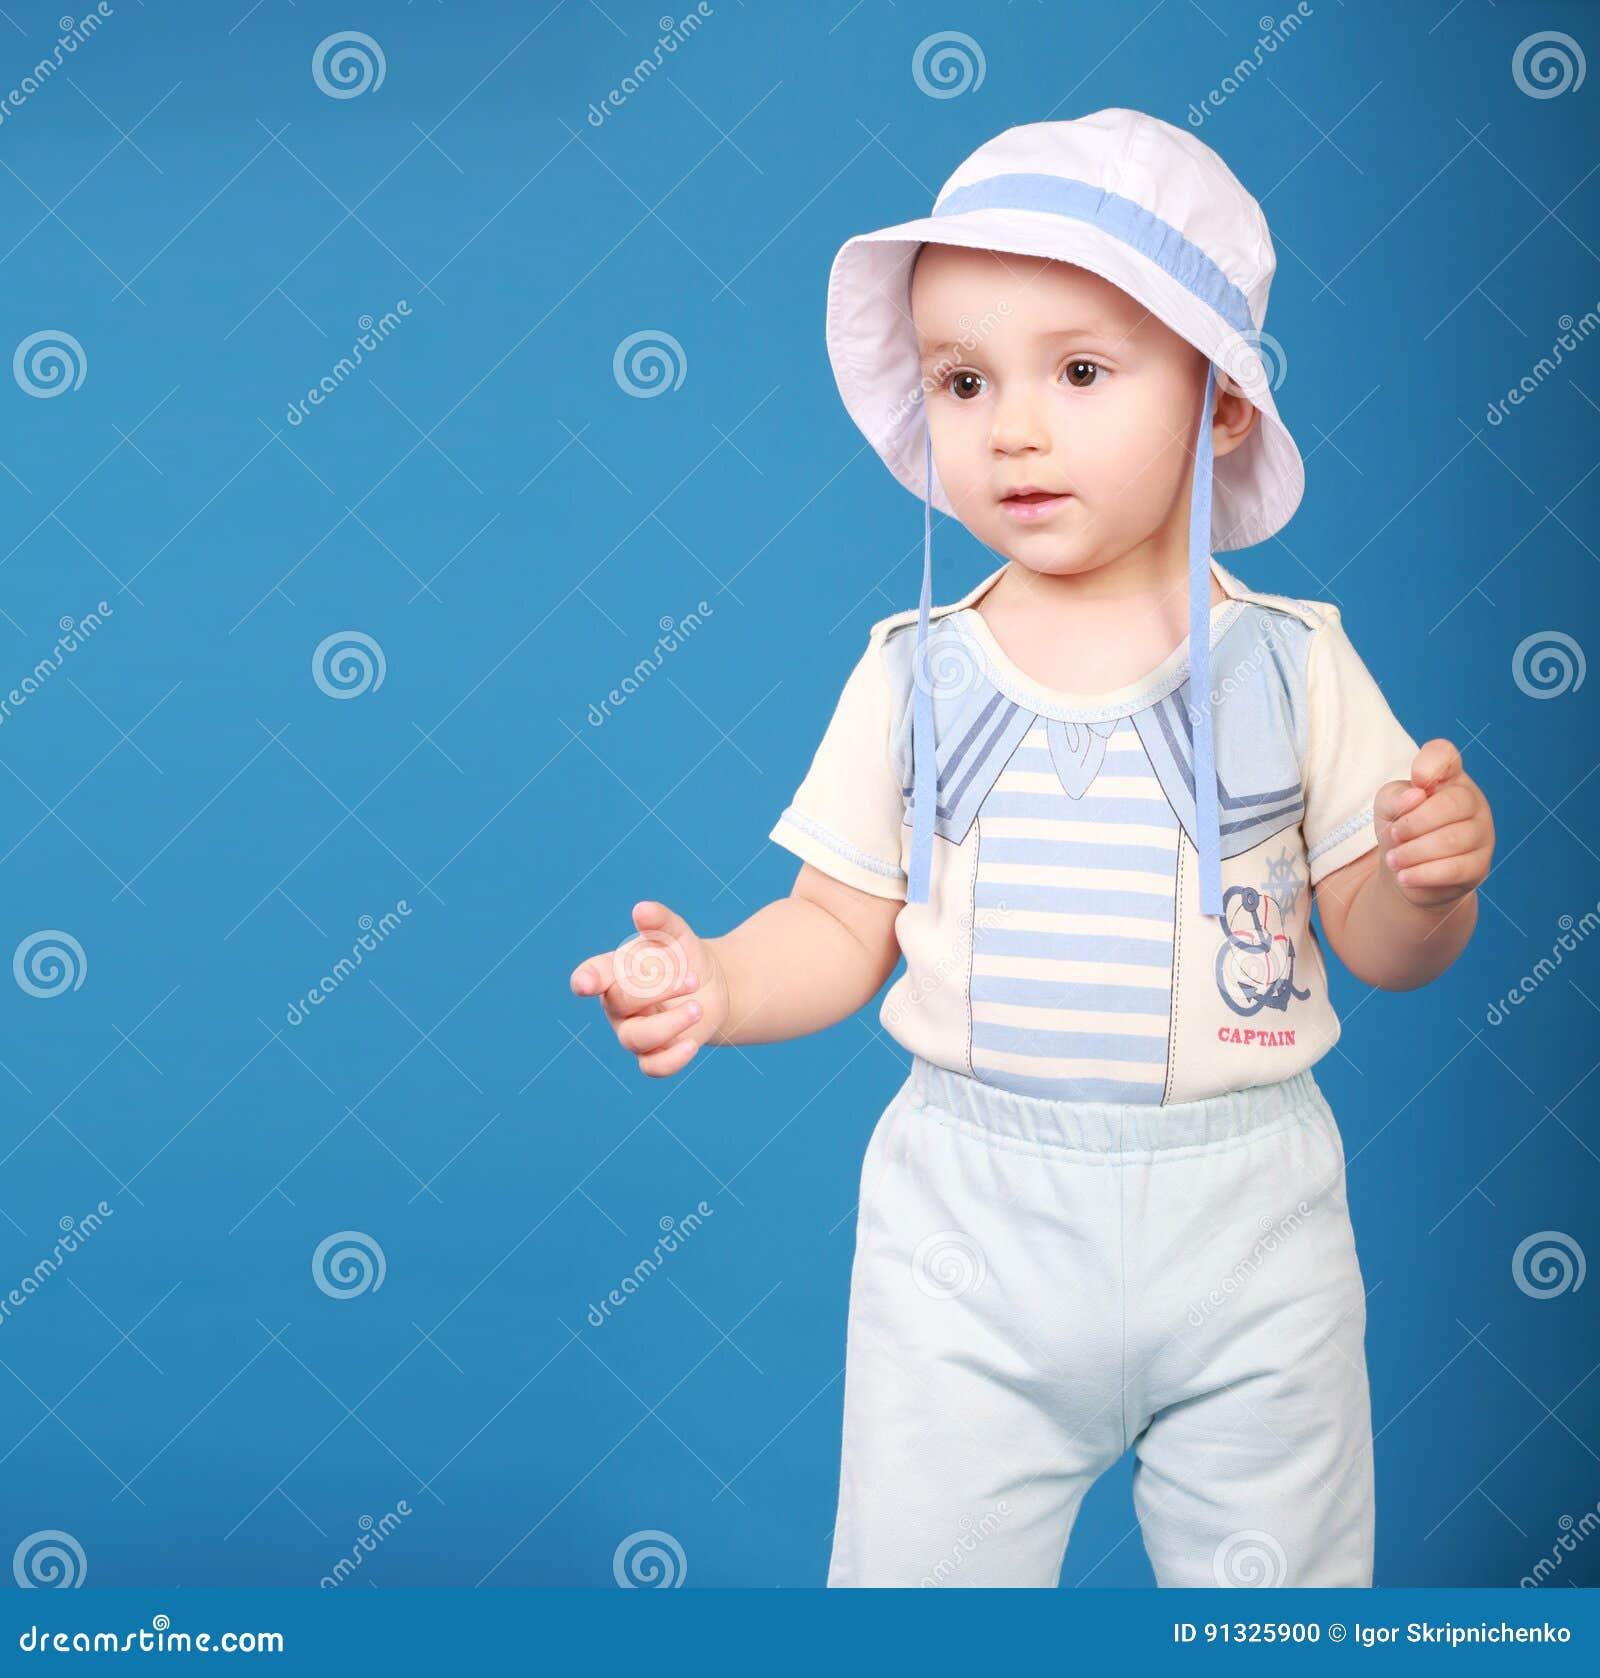 Garçon mignon se tenant sur un fond bleu portant un marin